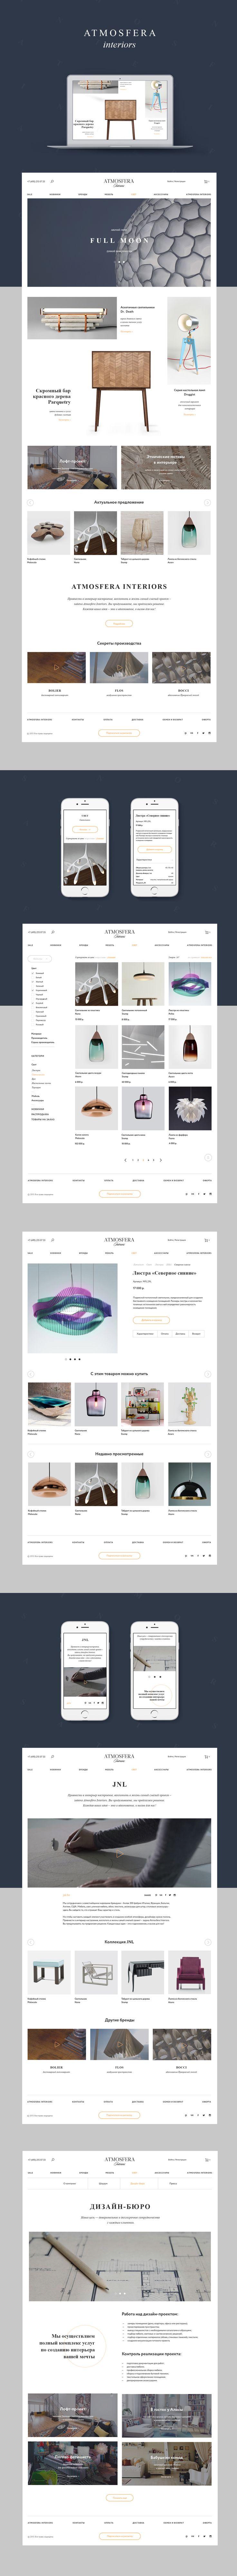 «Atmosfera Interiors» is interior design buro located in Moscow. The company…